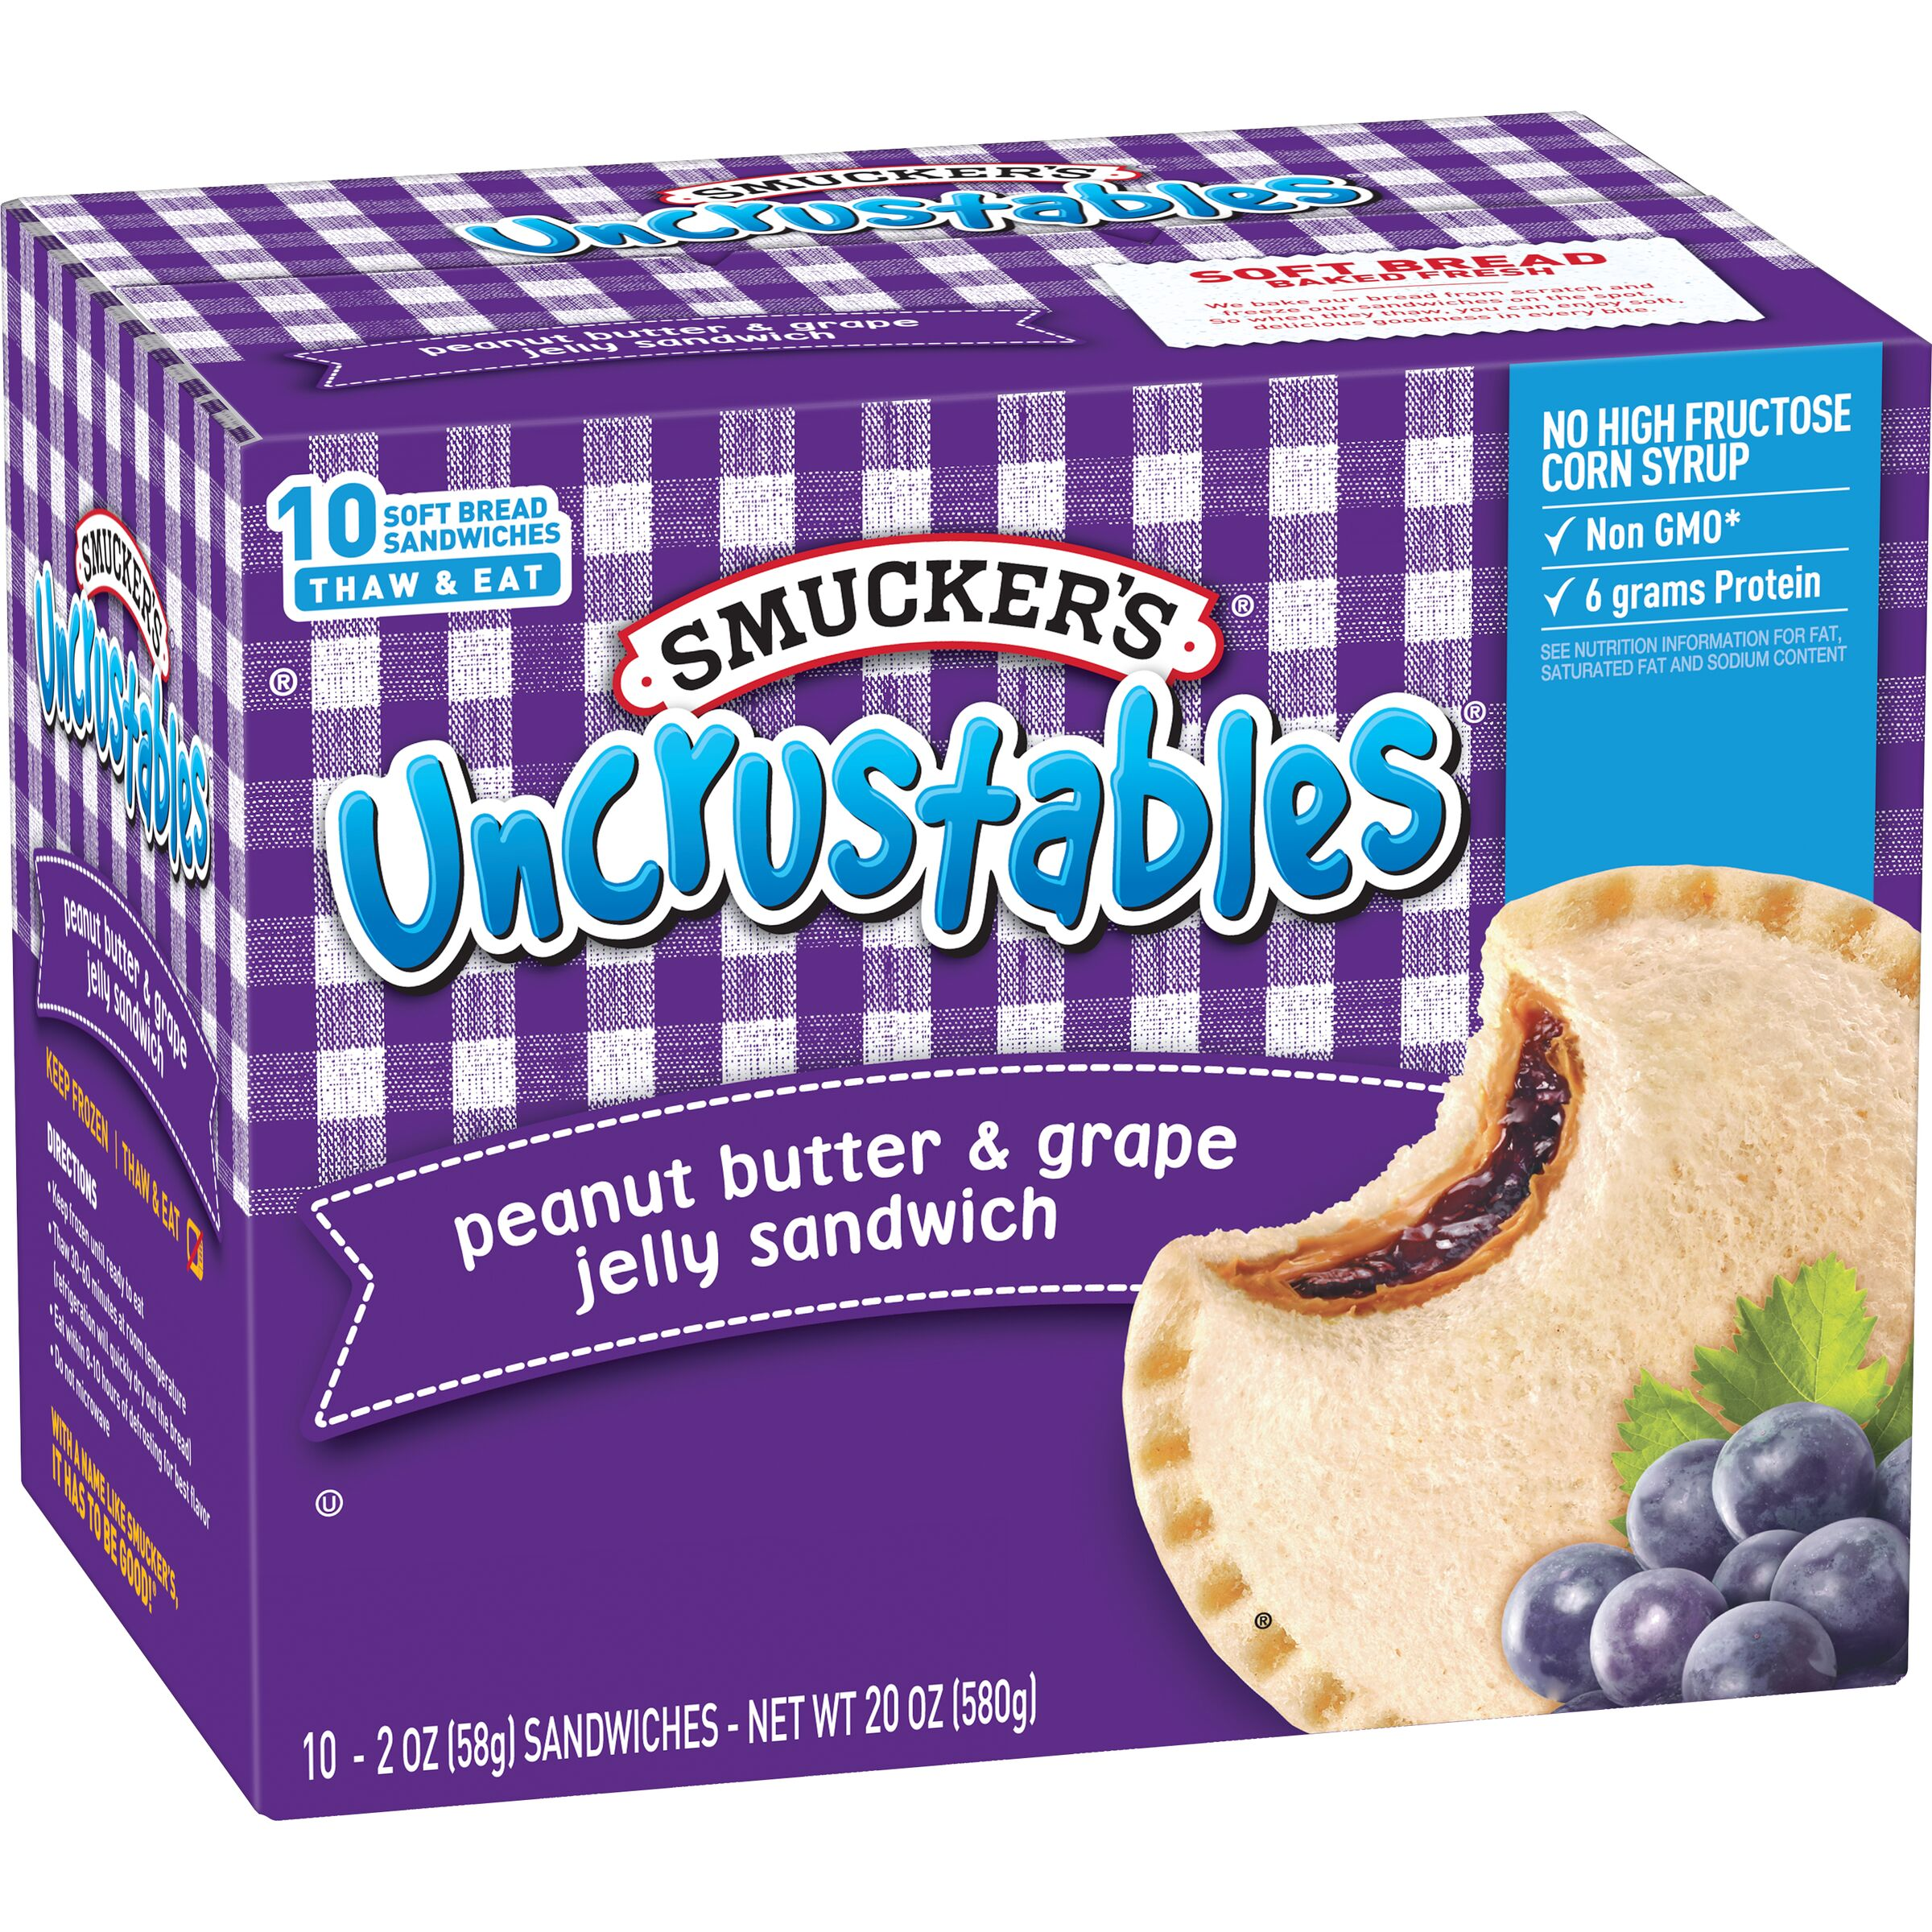 Smucker's Uncrustables Peanut Butter & Grape Jelly Sandwich